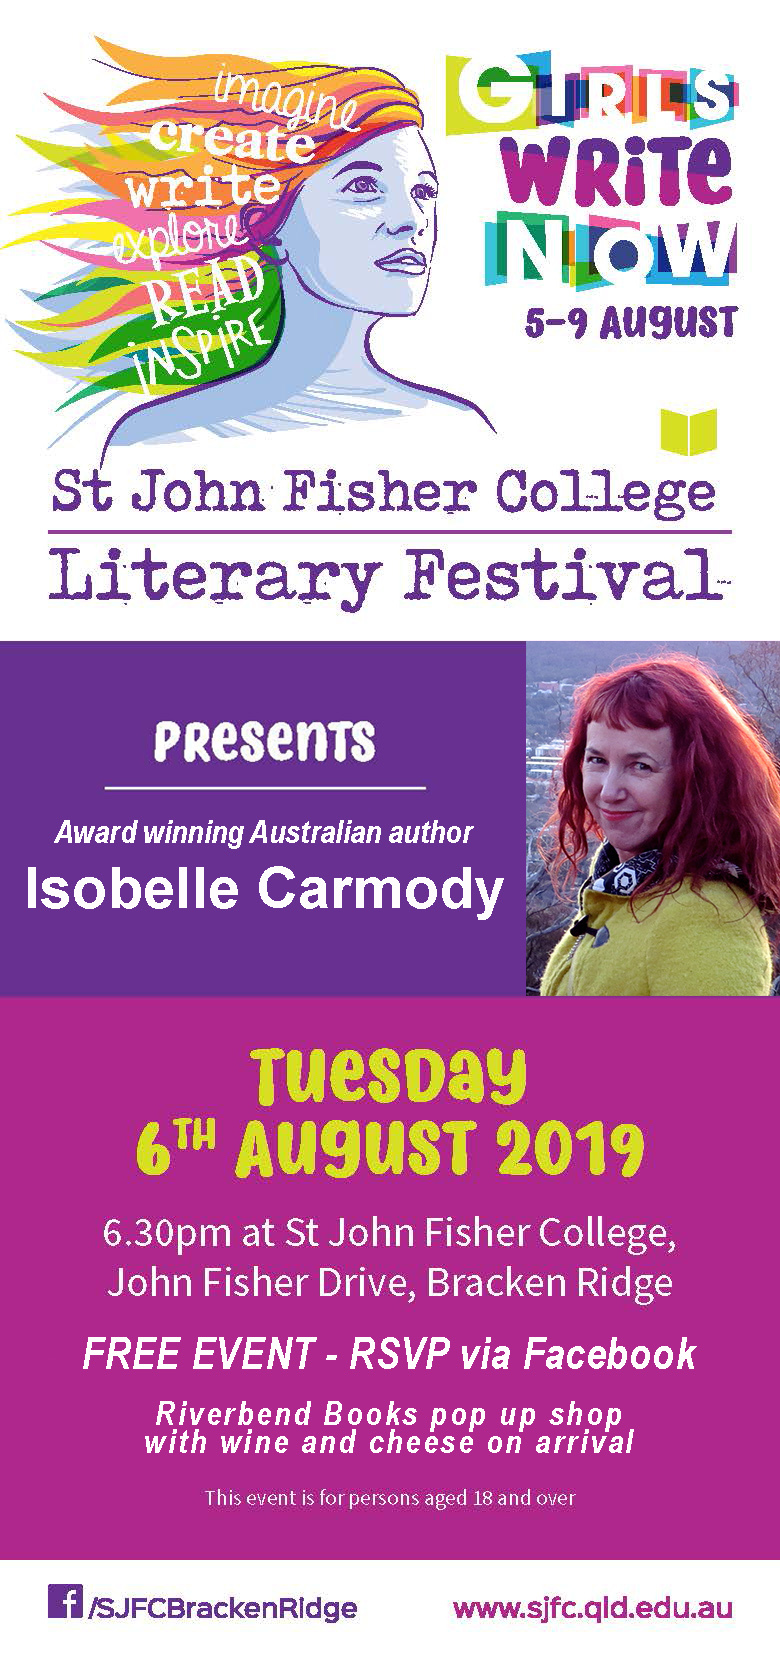 SJF-Literary-Festival.jpg?mtime=20190614